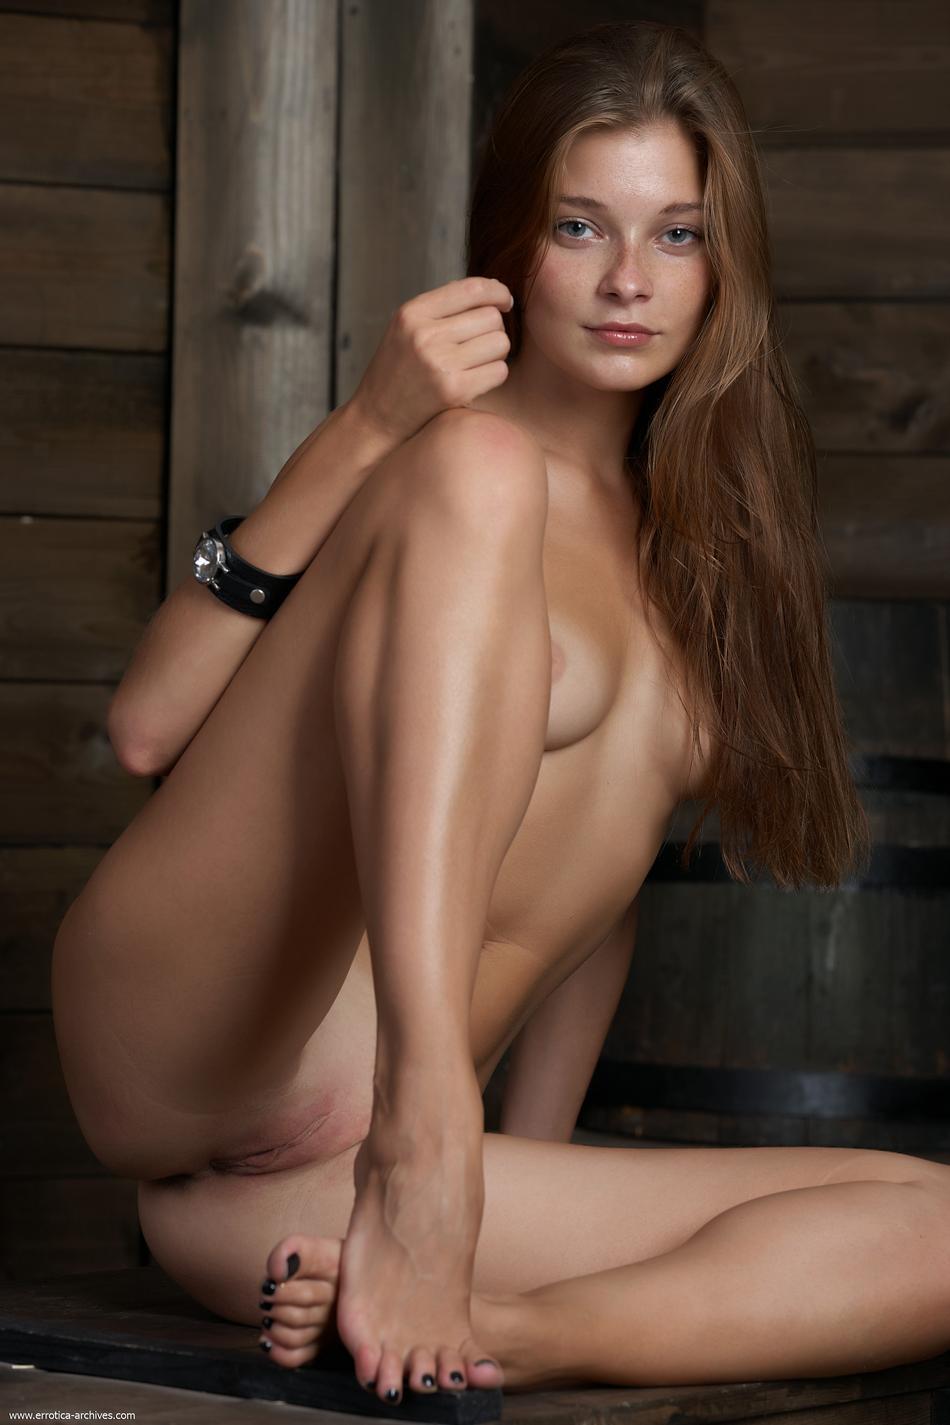 nude women of indiana